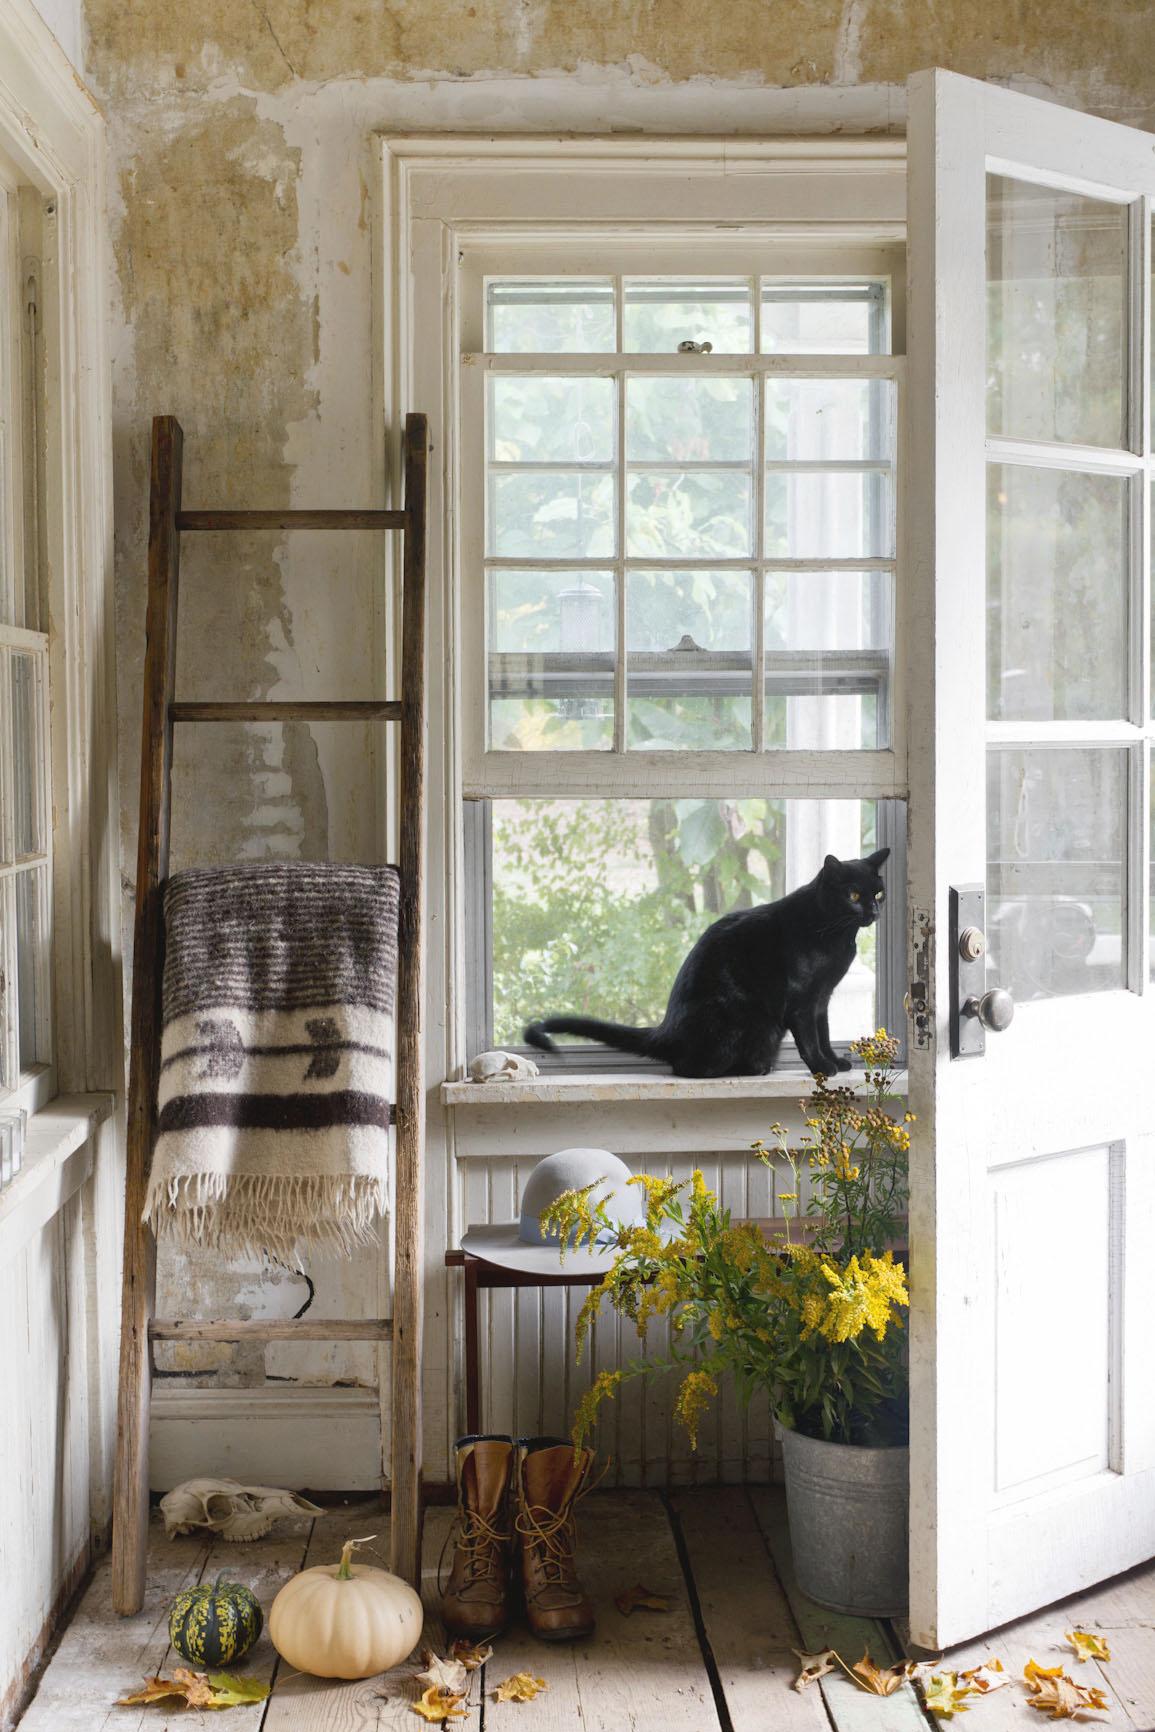 entryway-rustic-autumn-interior-photography.jpg